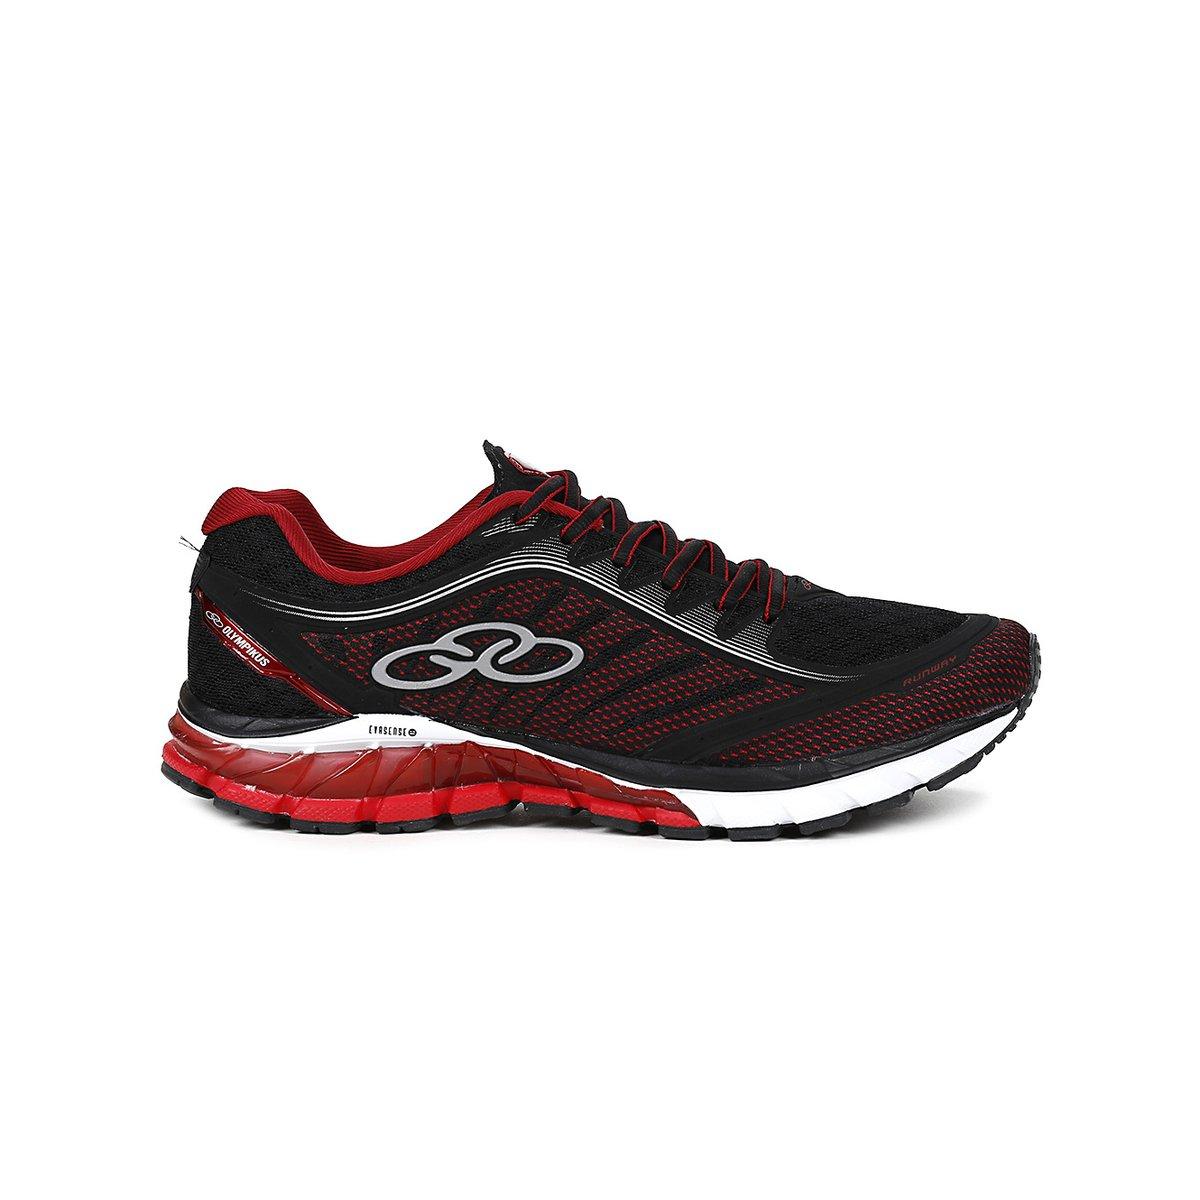 Esportivo Preto Runway Masculino Masculino Preto Tênis e Olympikus v e v Tênis Runway Vermelho Olympikus Vermelho Esportivo CffrnwXq